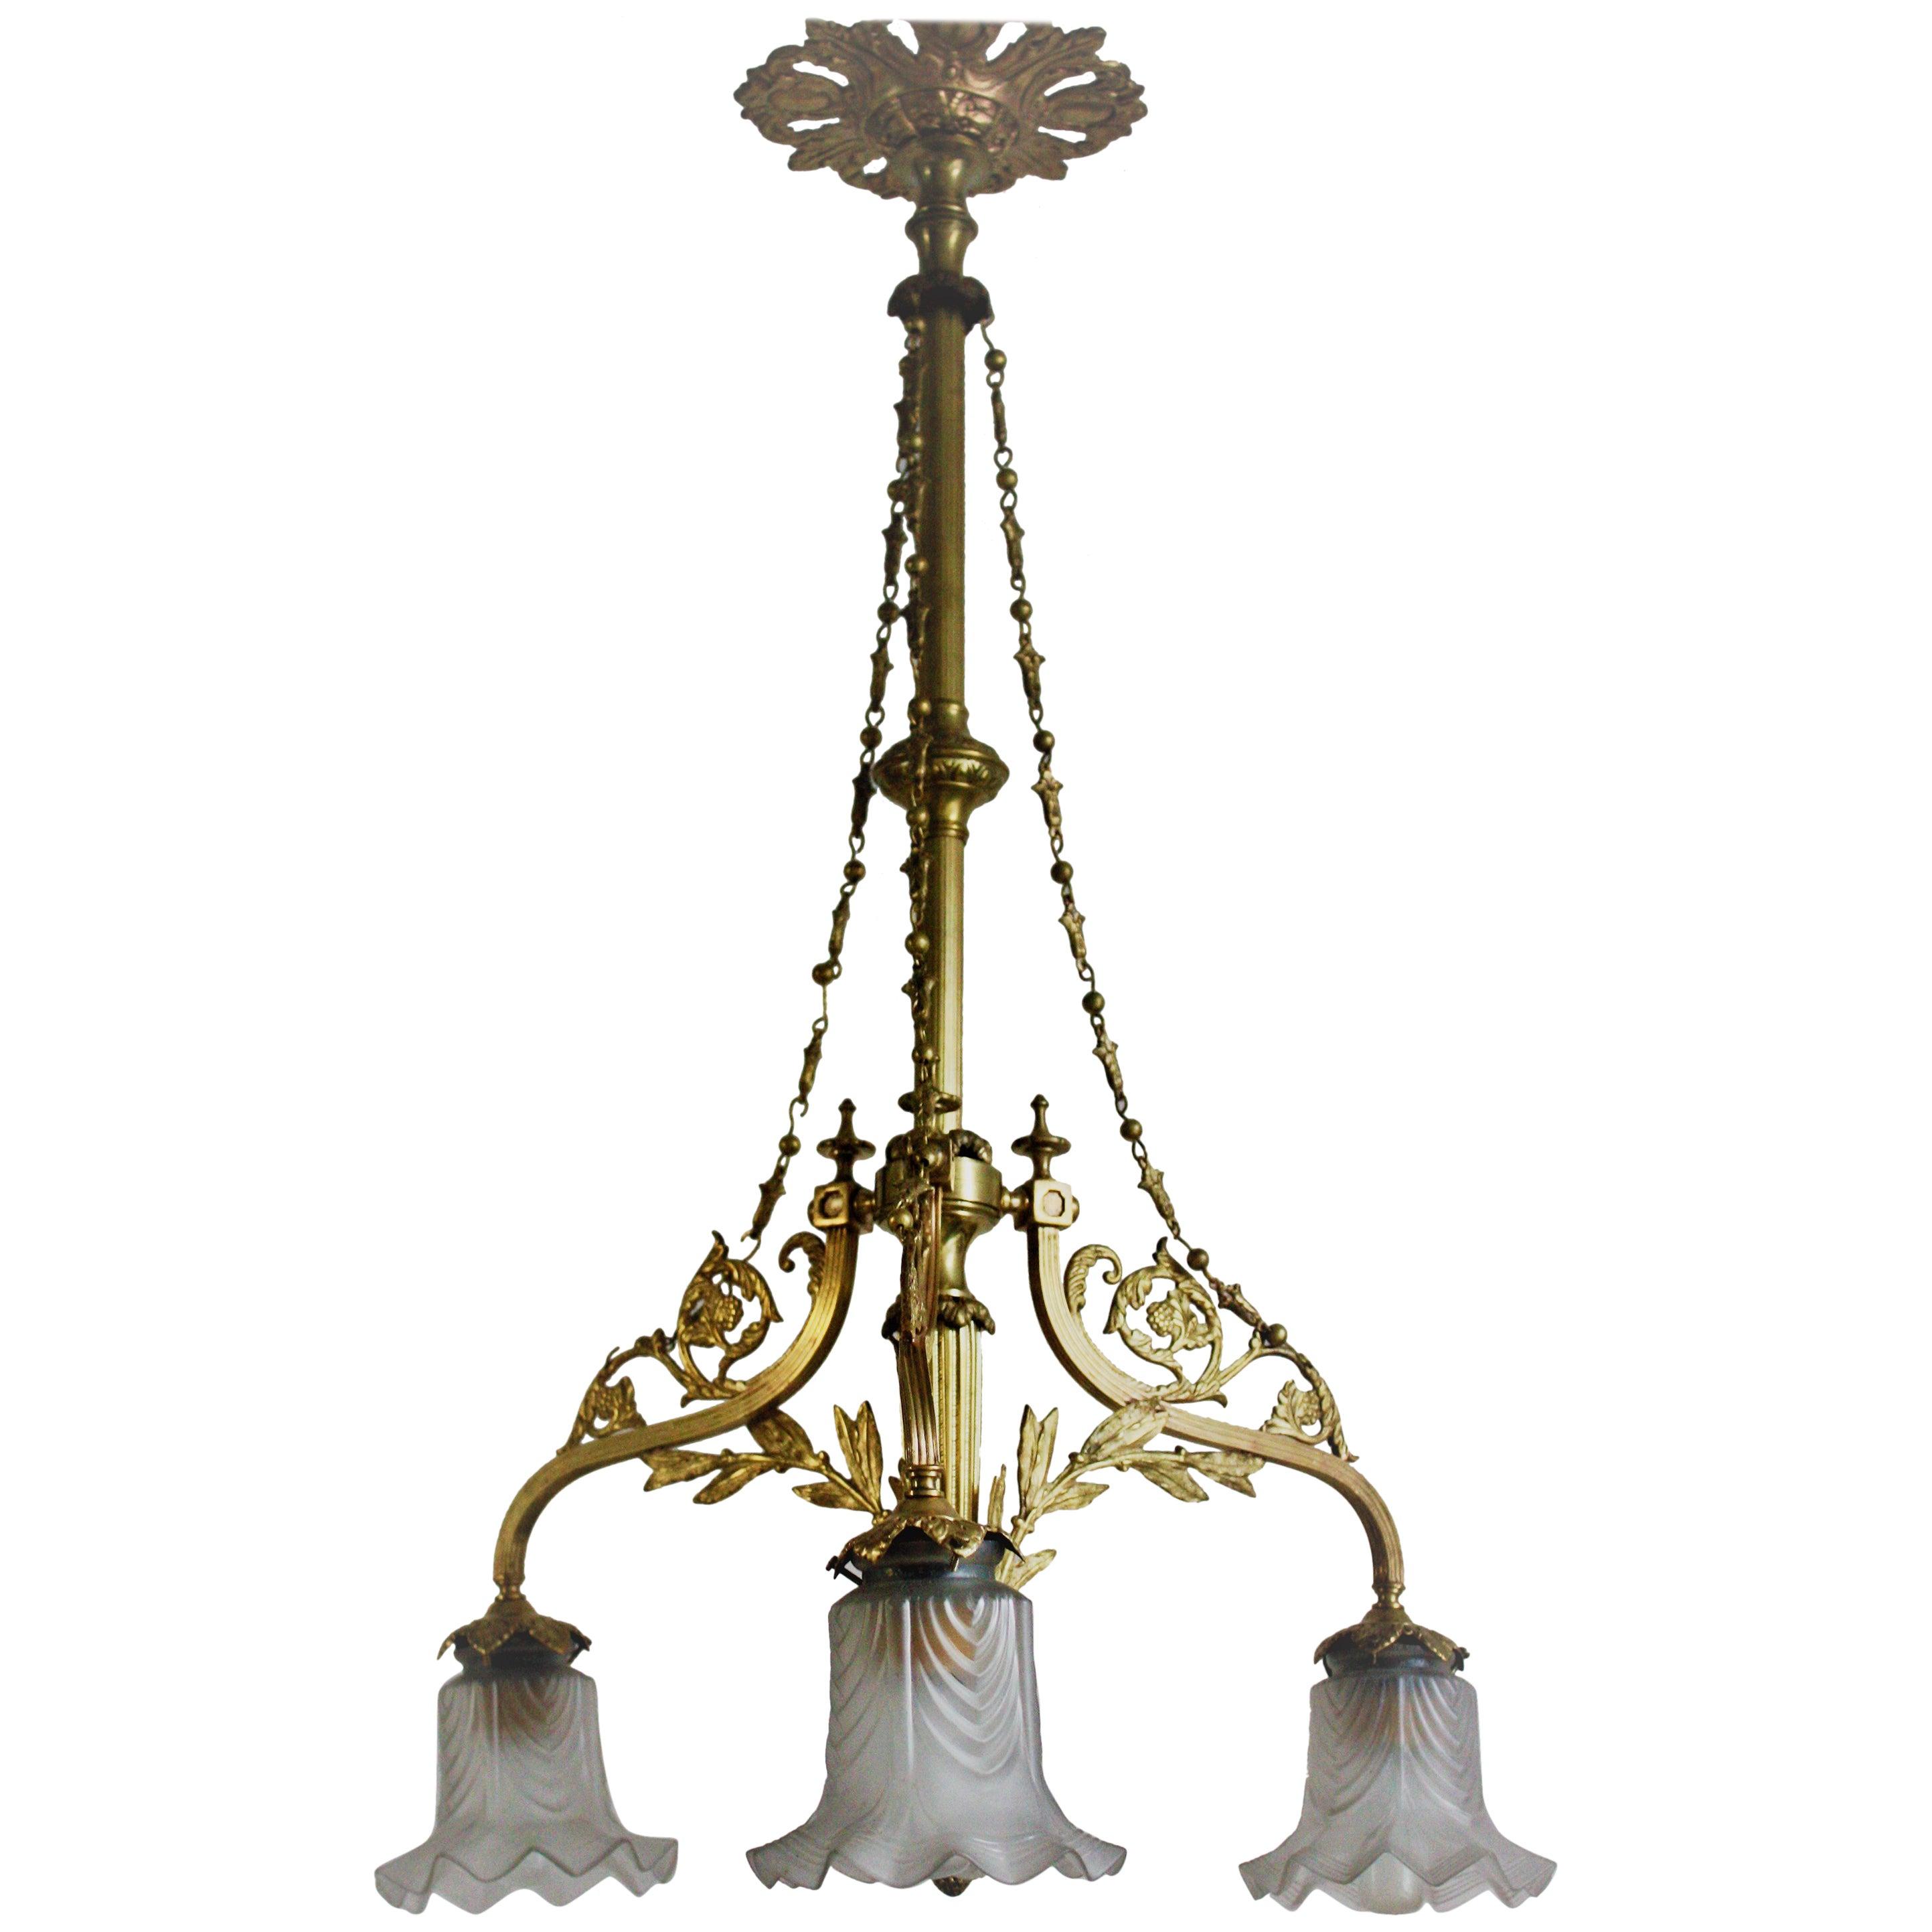 Beautiful Art Nouveau Brass and Glass Chandelier, circa 1900s